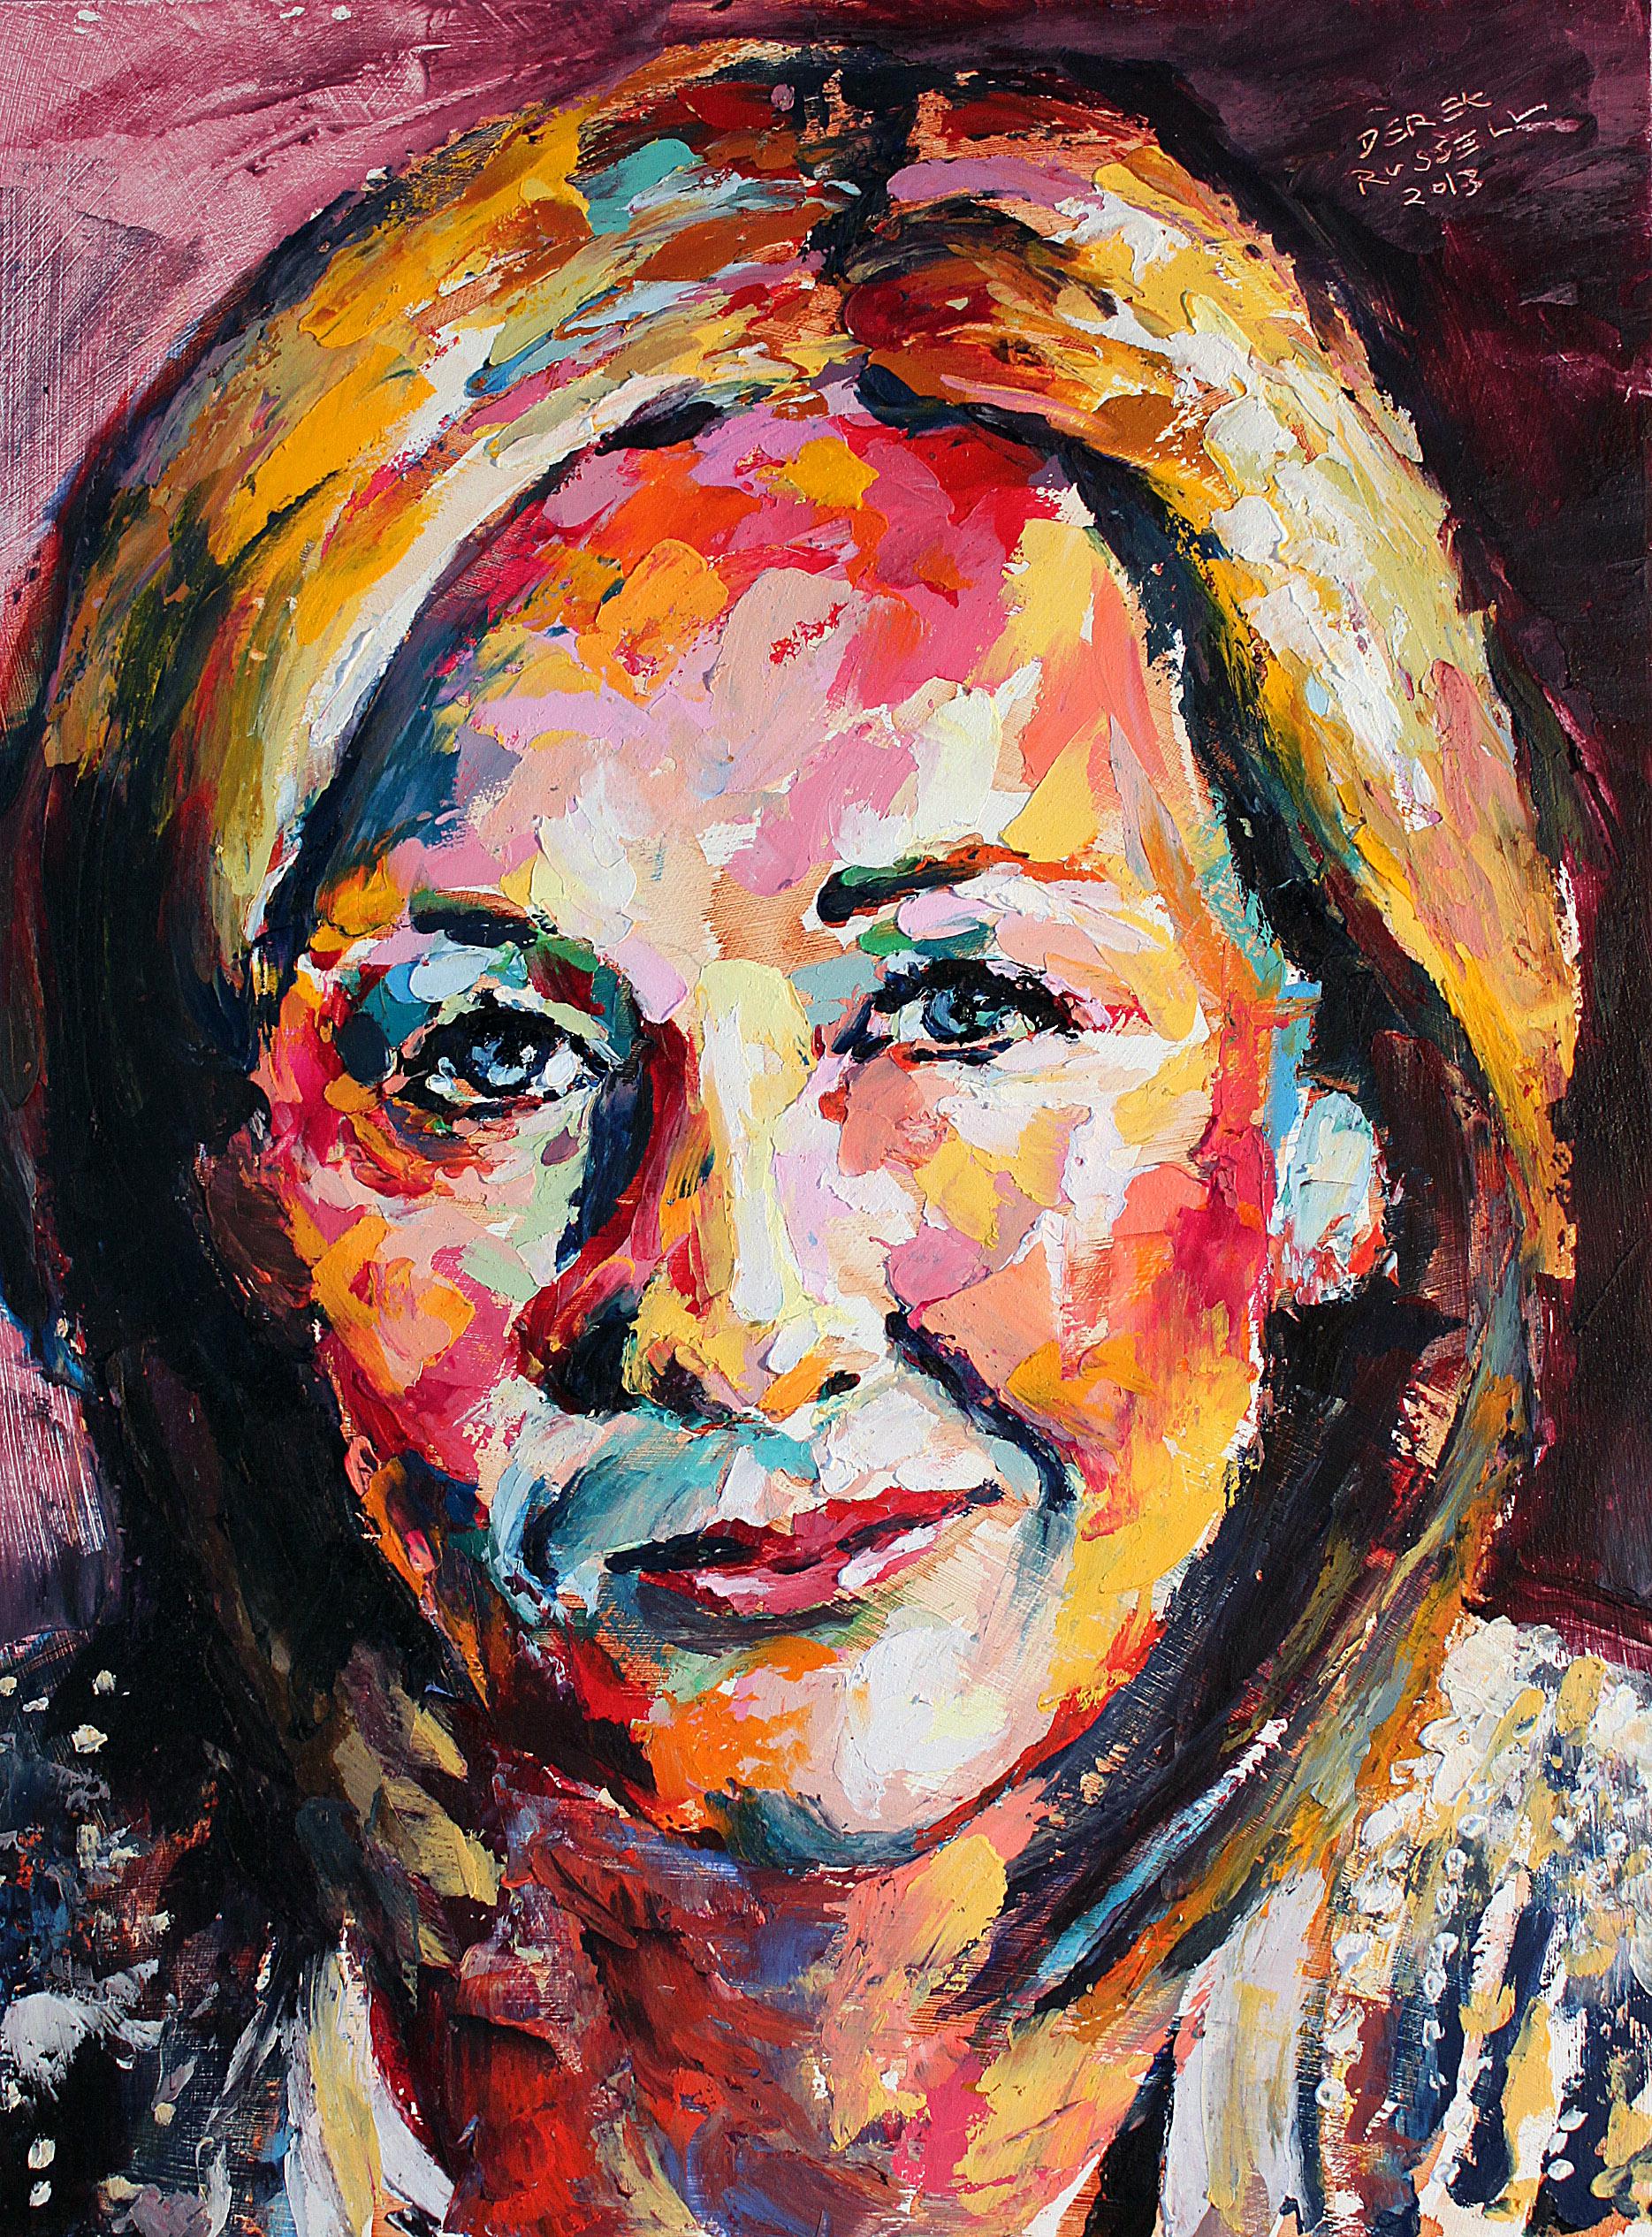 J.K. Rowling Original Acrylic & Oil Portrait Painting by Artist Derek Russell 2013.jpg